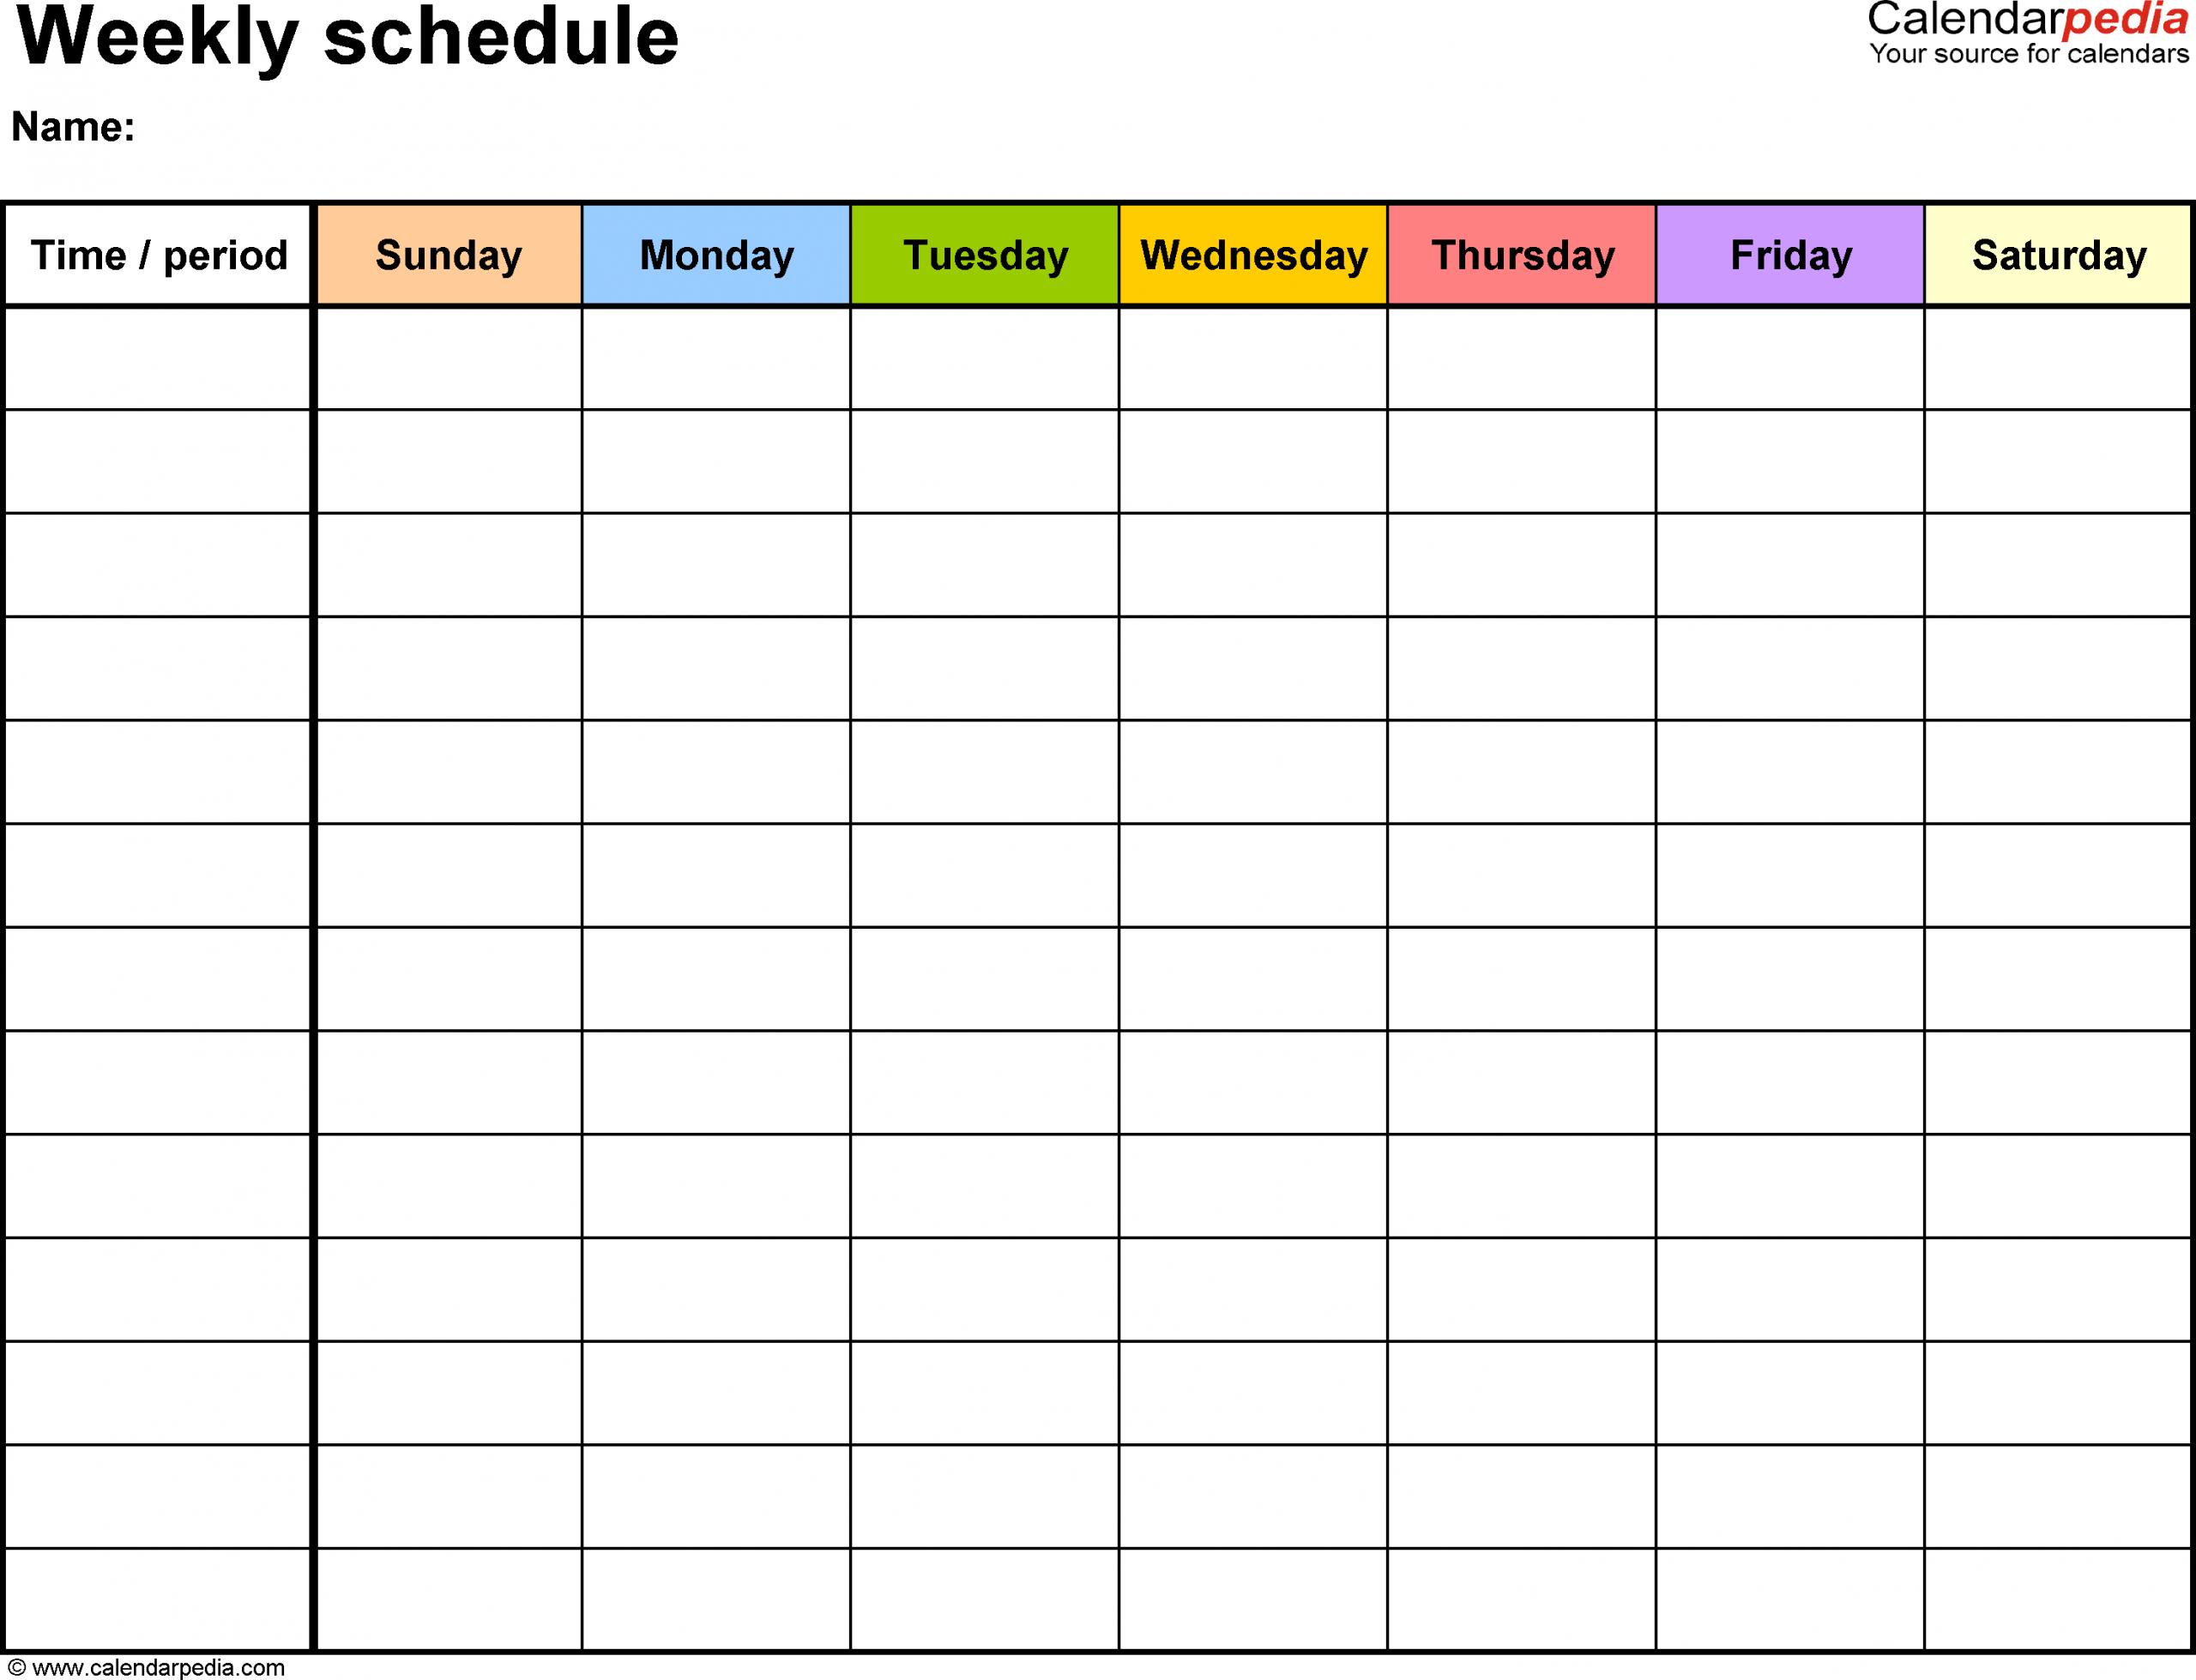 Schedule Chart Maker  Bobi.karikaturize in Calendar Maker Free Printable